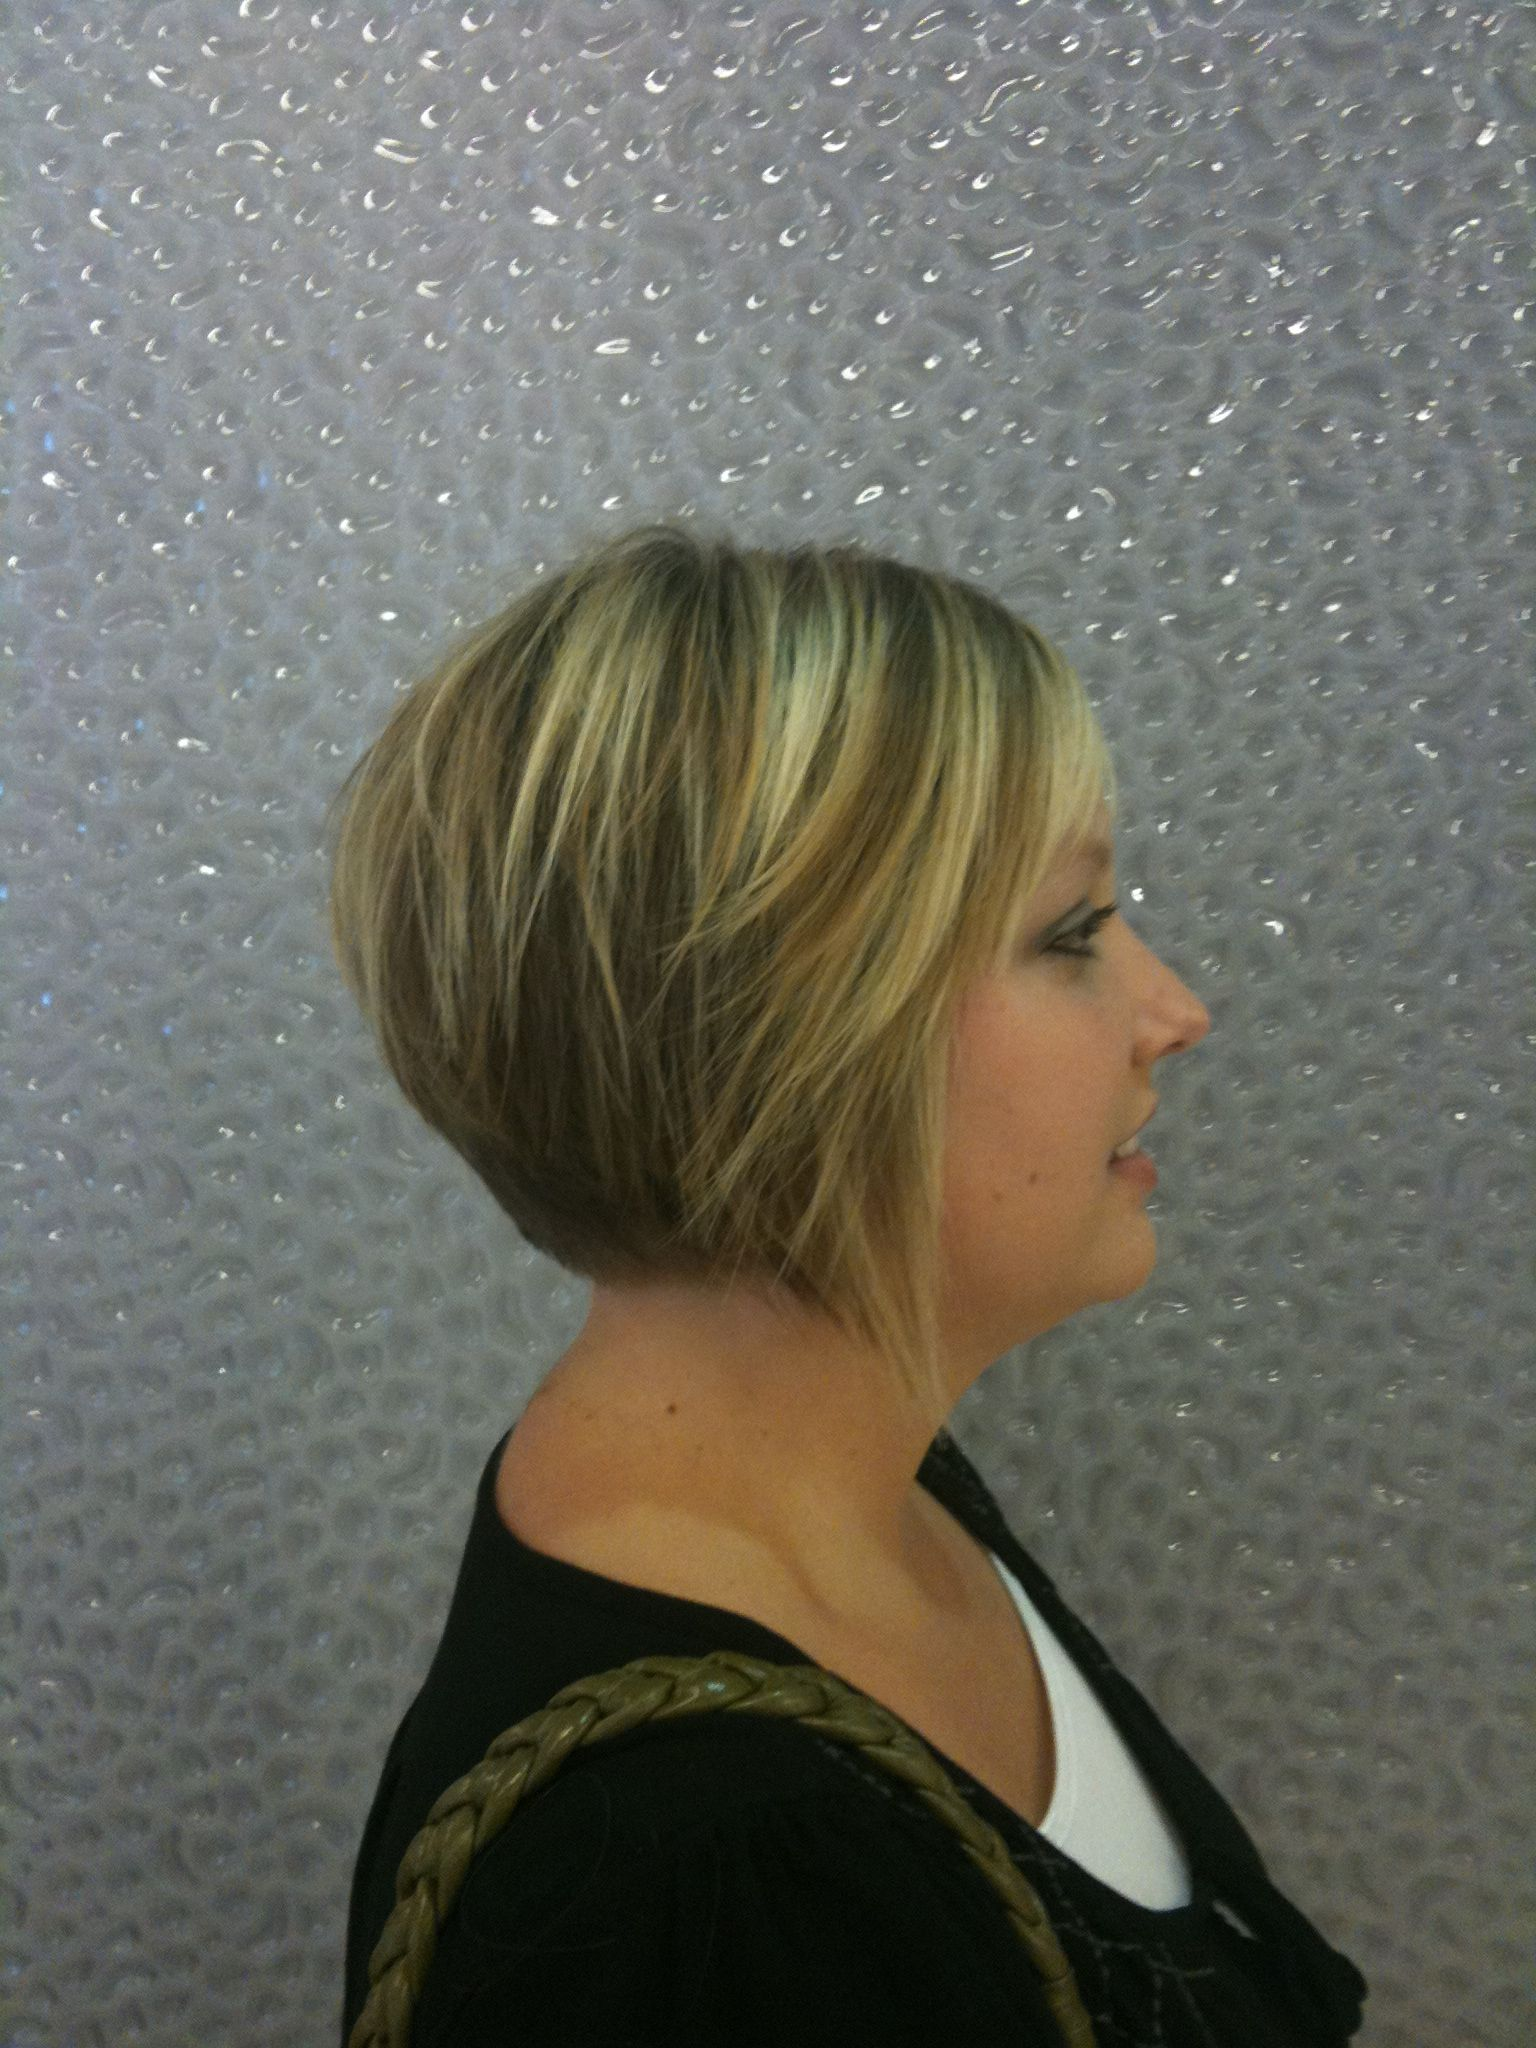 Short Bob Hairstyles Back View - Bing Images | Hair ...